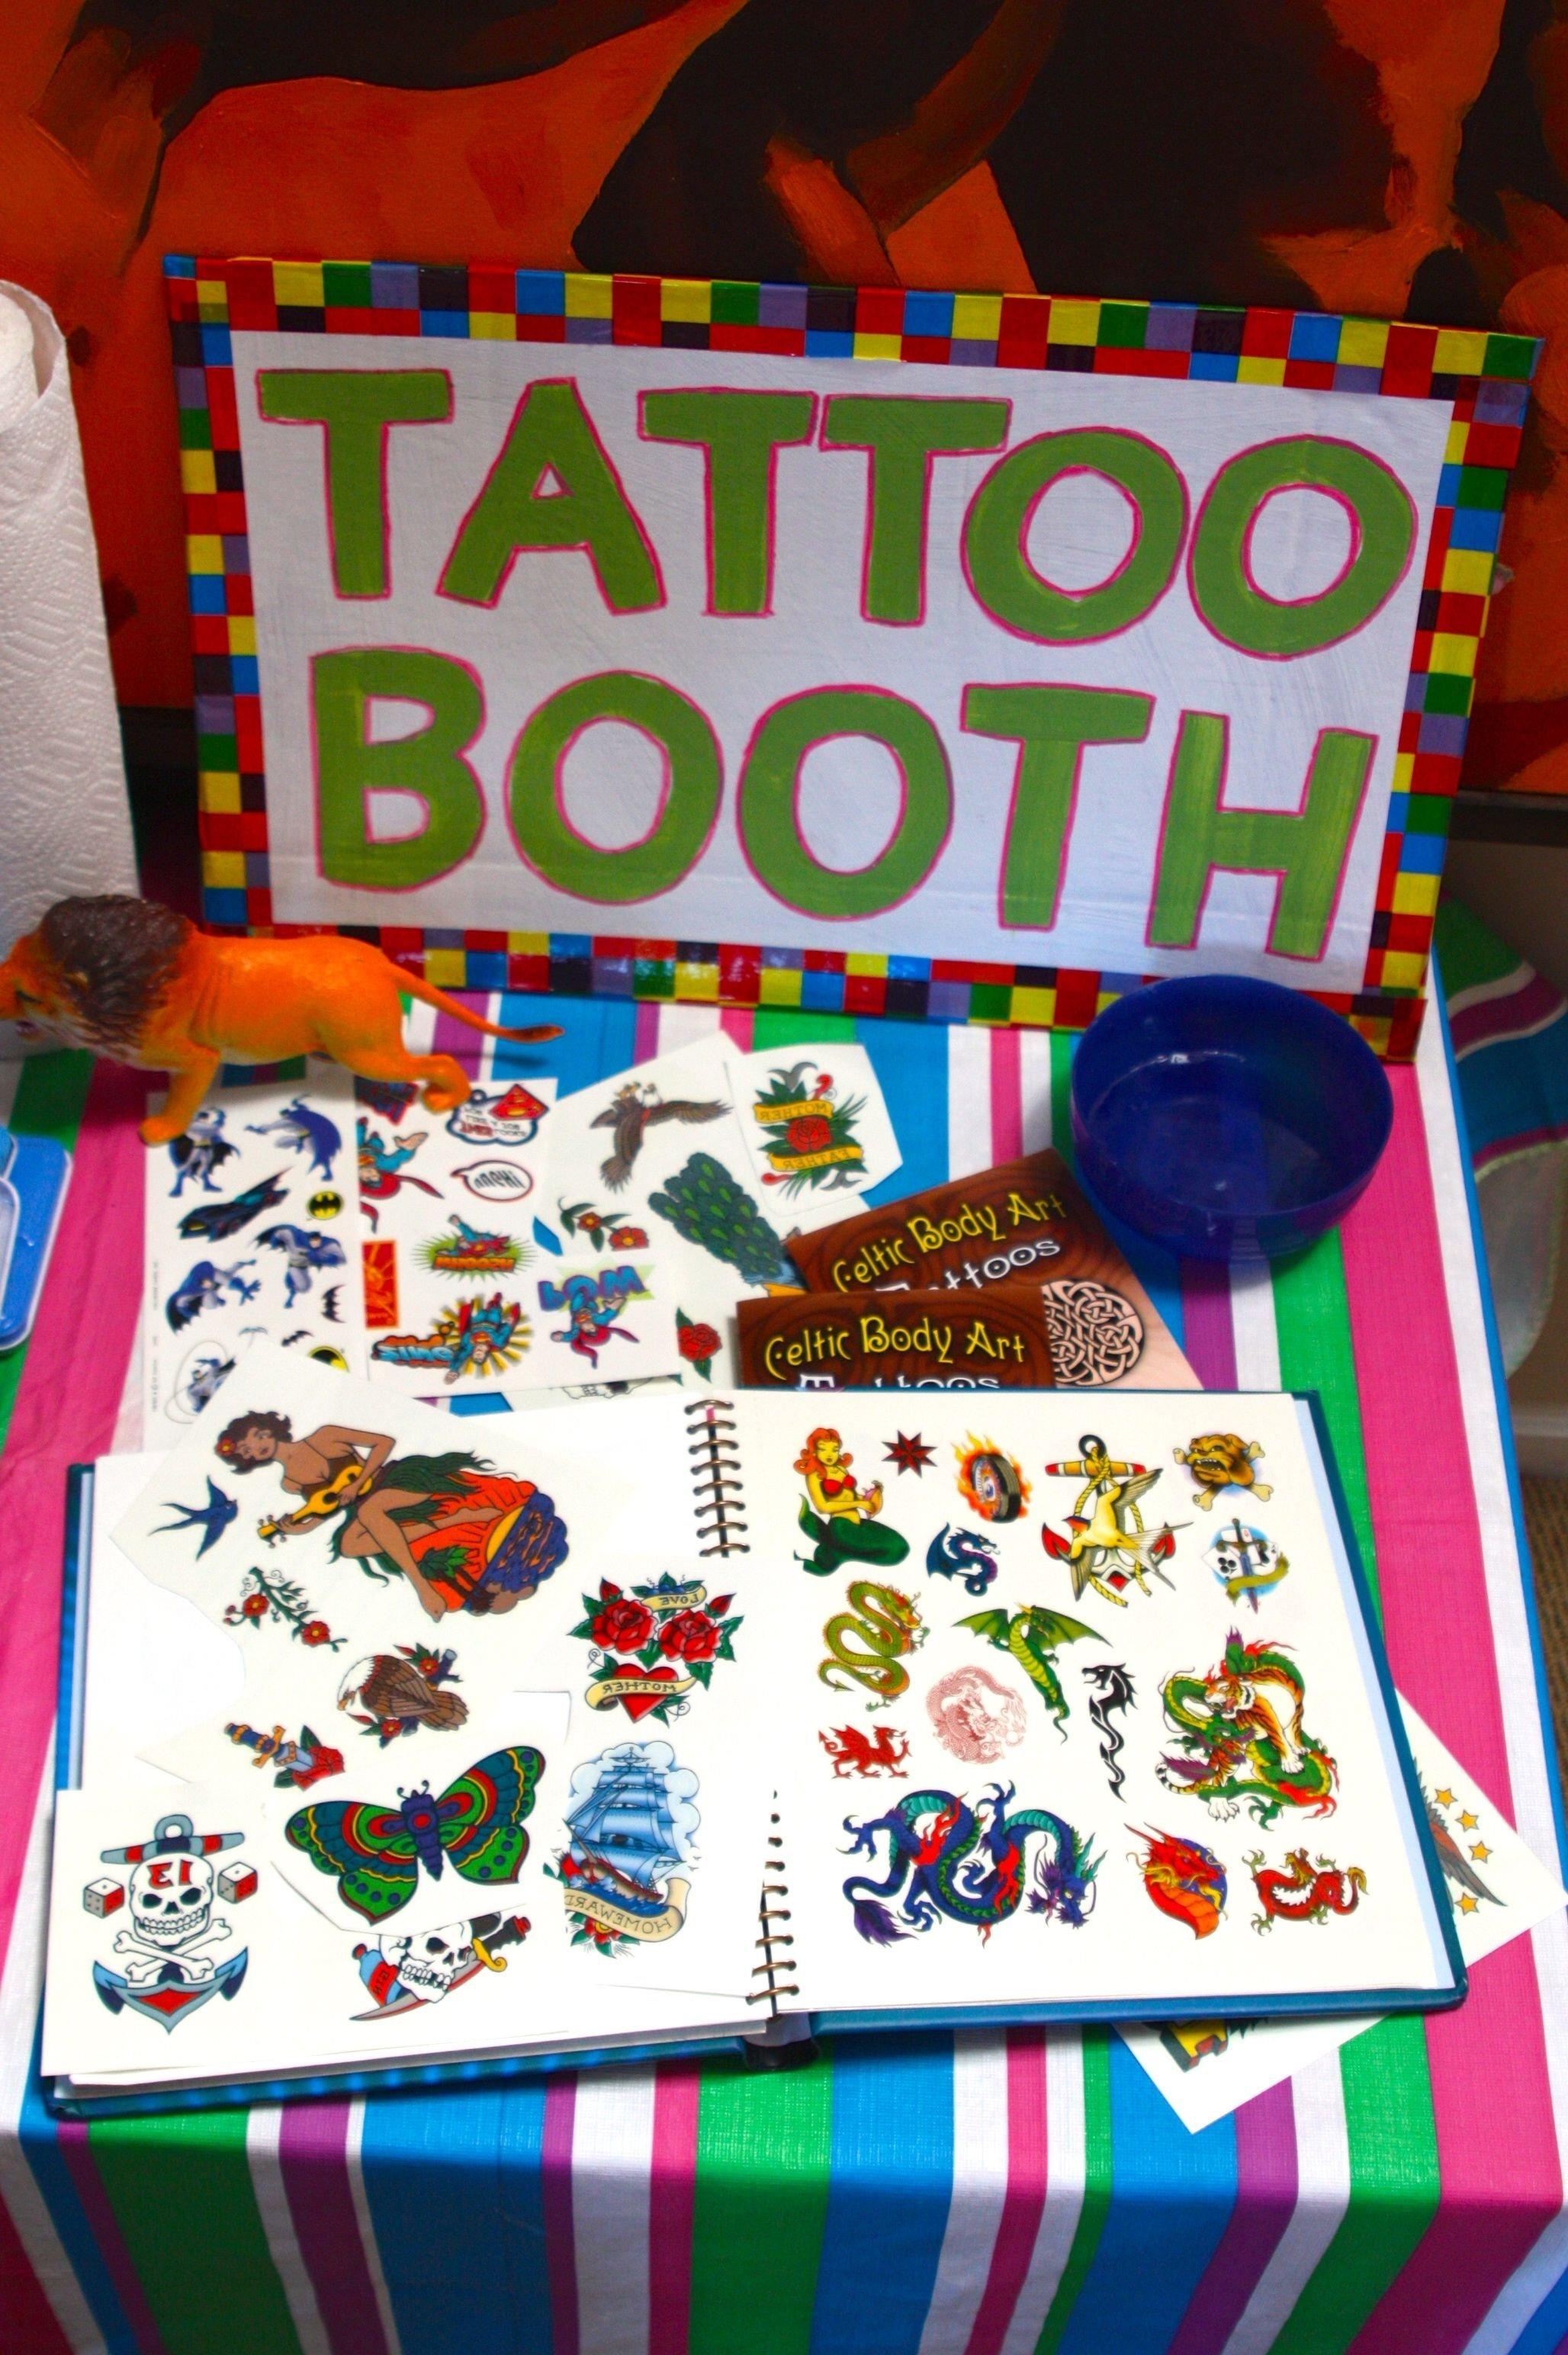 10 Trendy Halloween Birthday Party Ideas For Kids f09f8e88 fiestas infantiles f09f8e82 91 ideas de cumpleanos f09f8e81 tattoo 1 2021